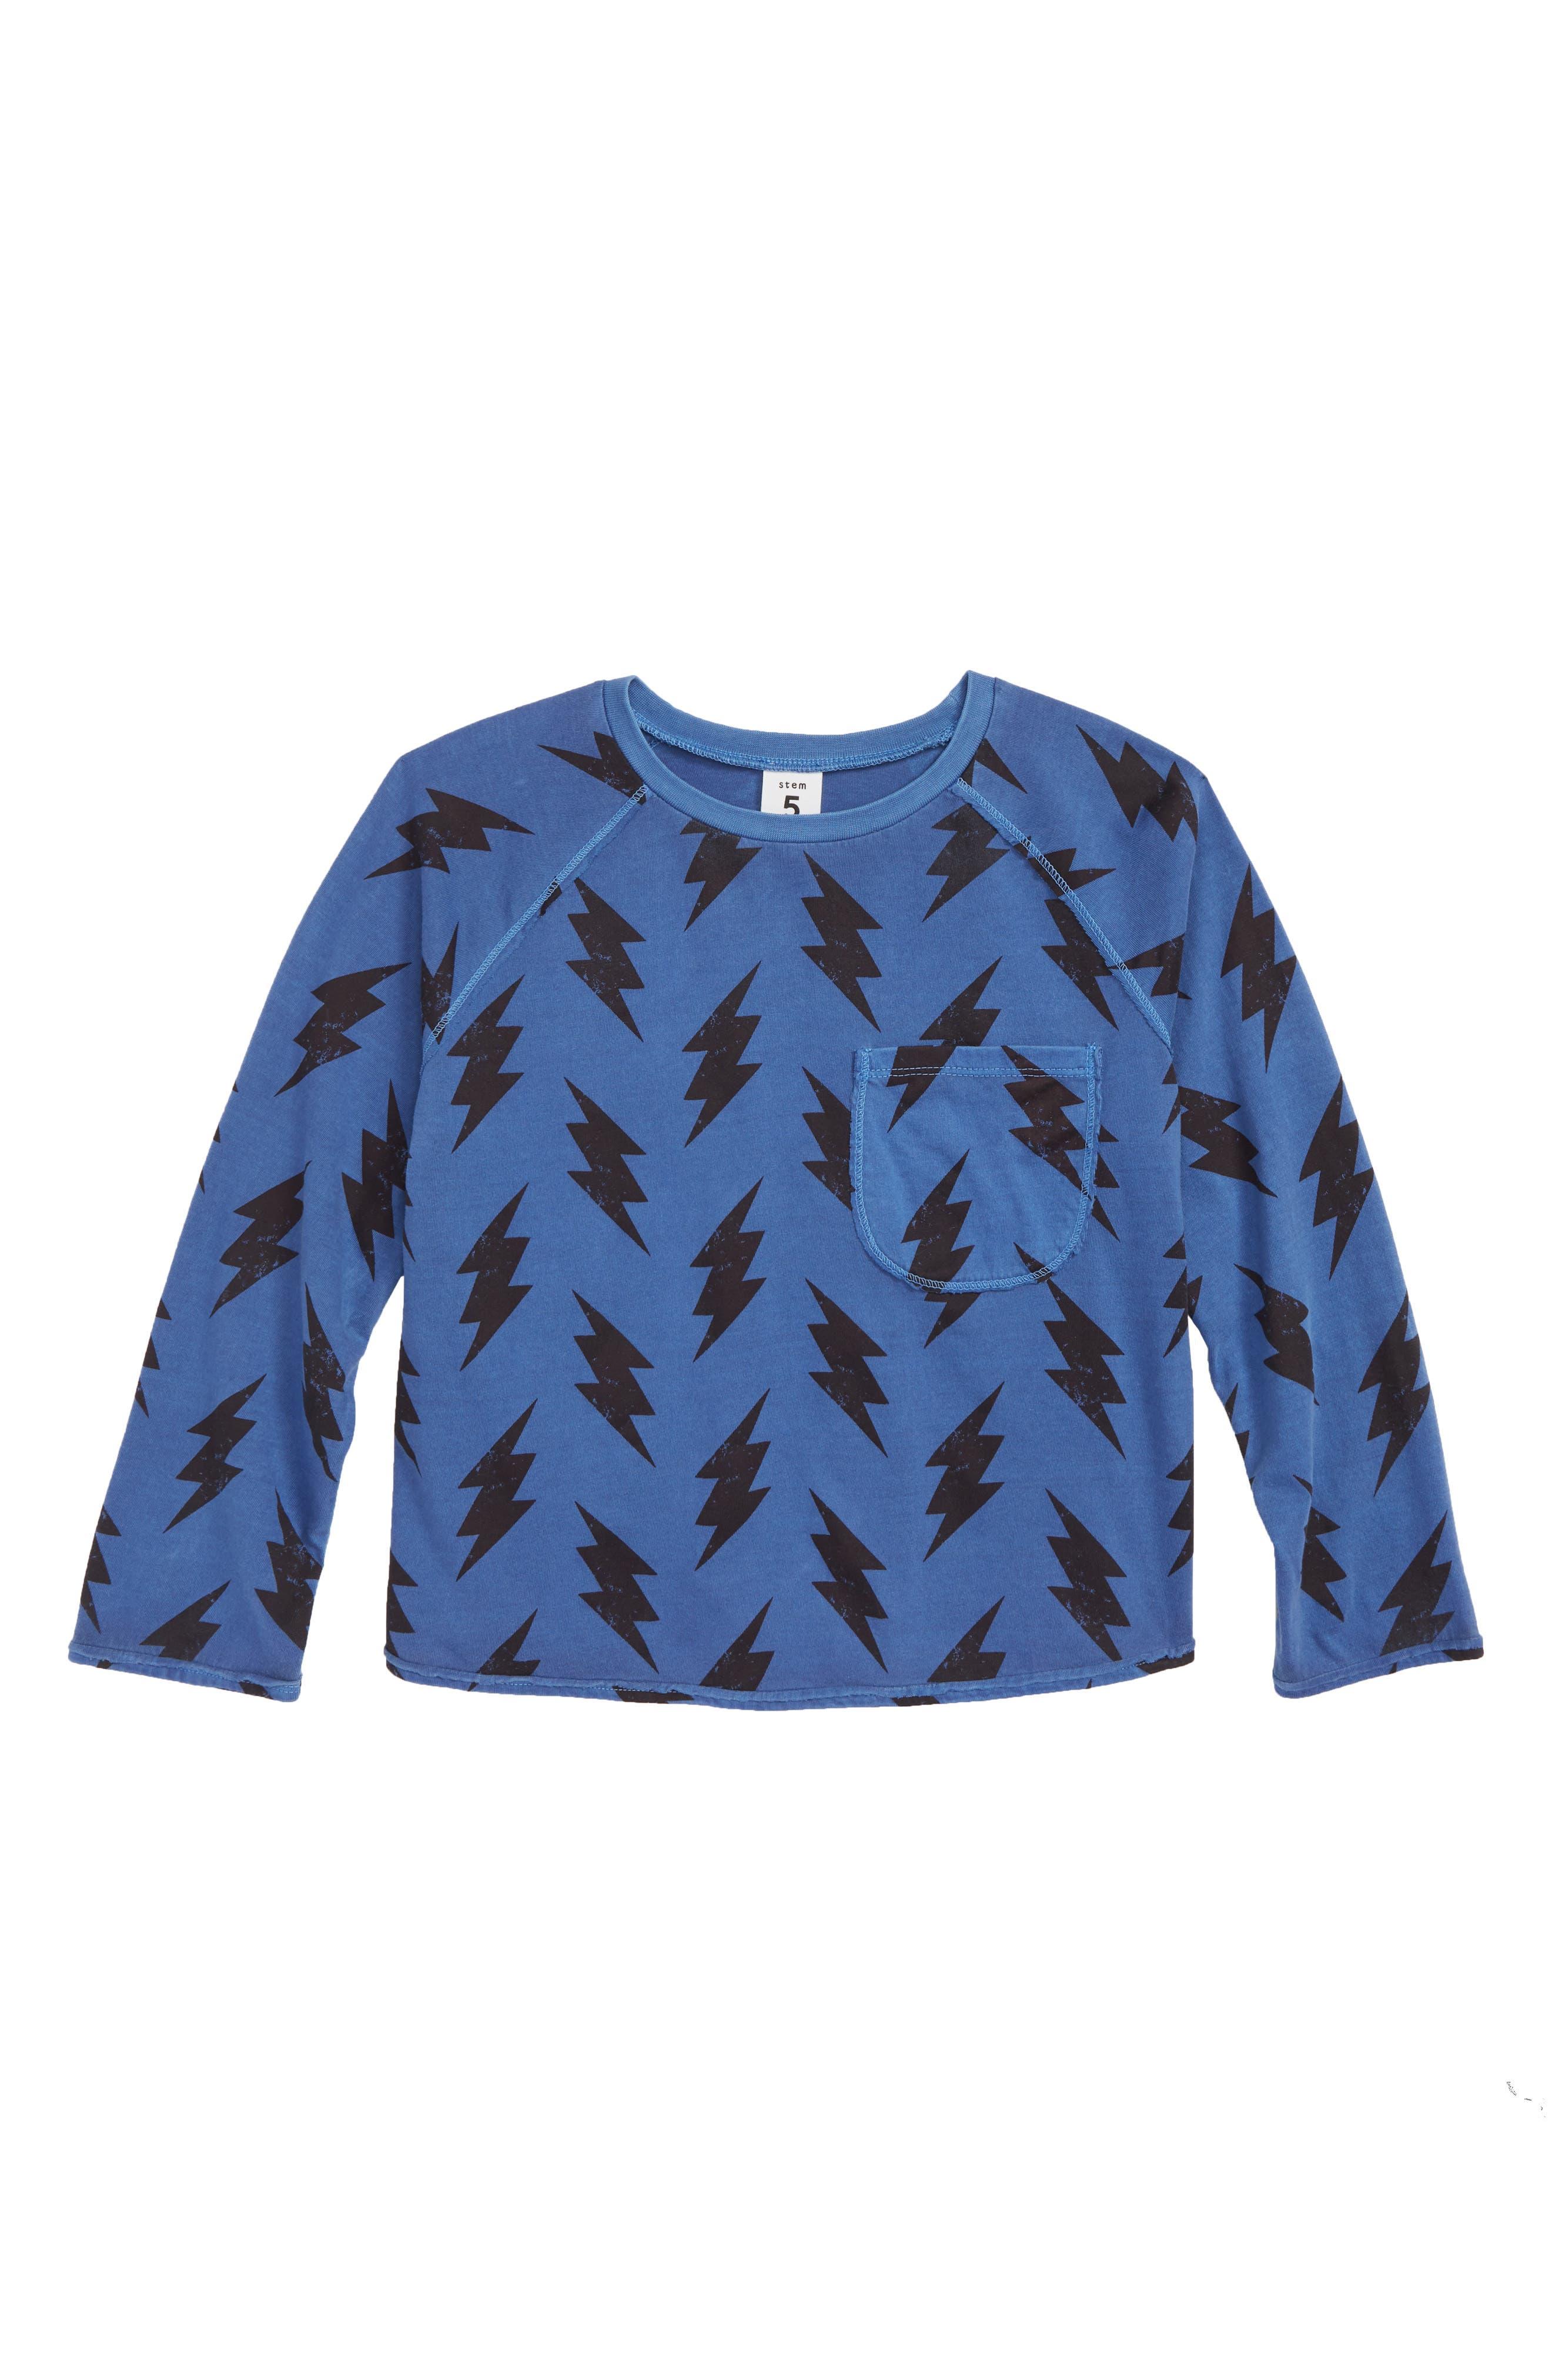 Lightning Print T-Shirt,                             Main thumbnail 1, color,                             BLUE MAZARINE BOLTS